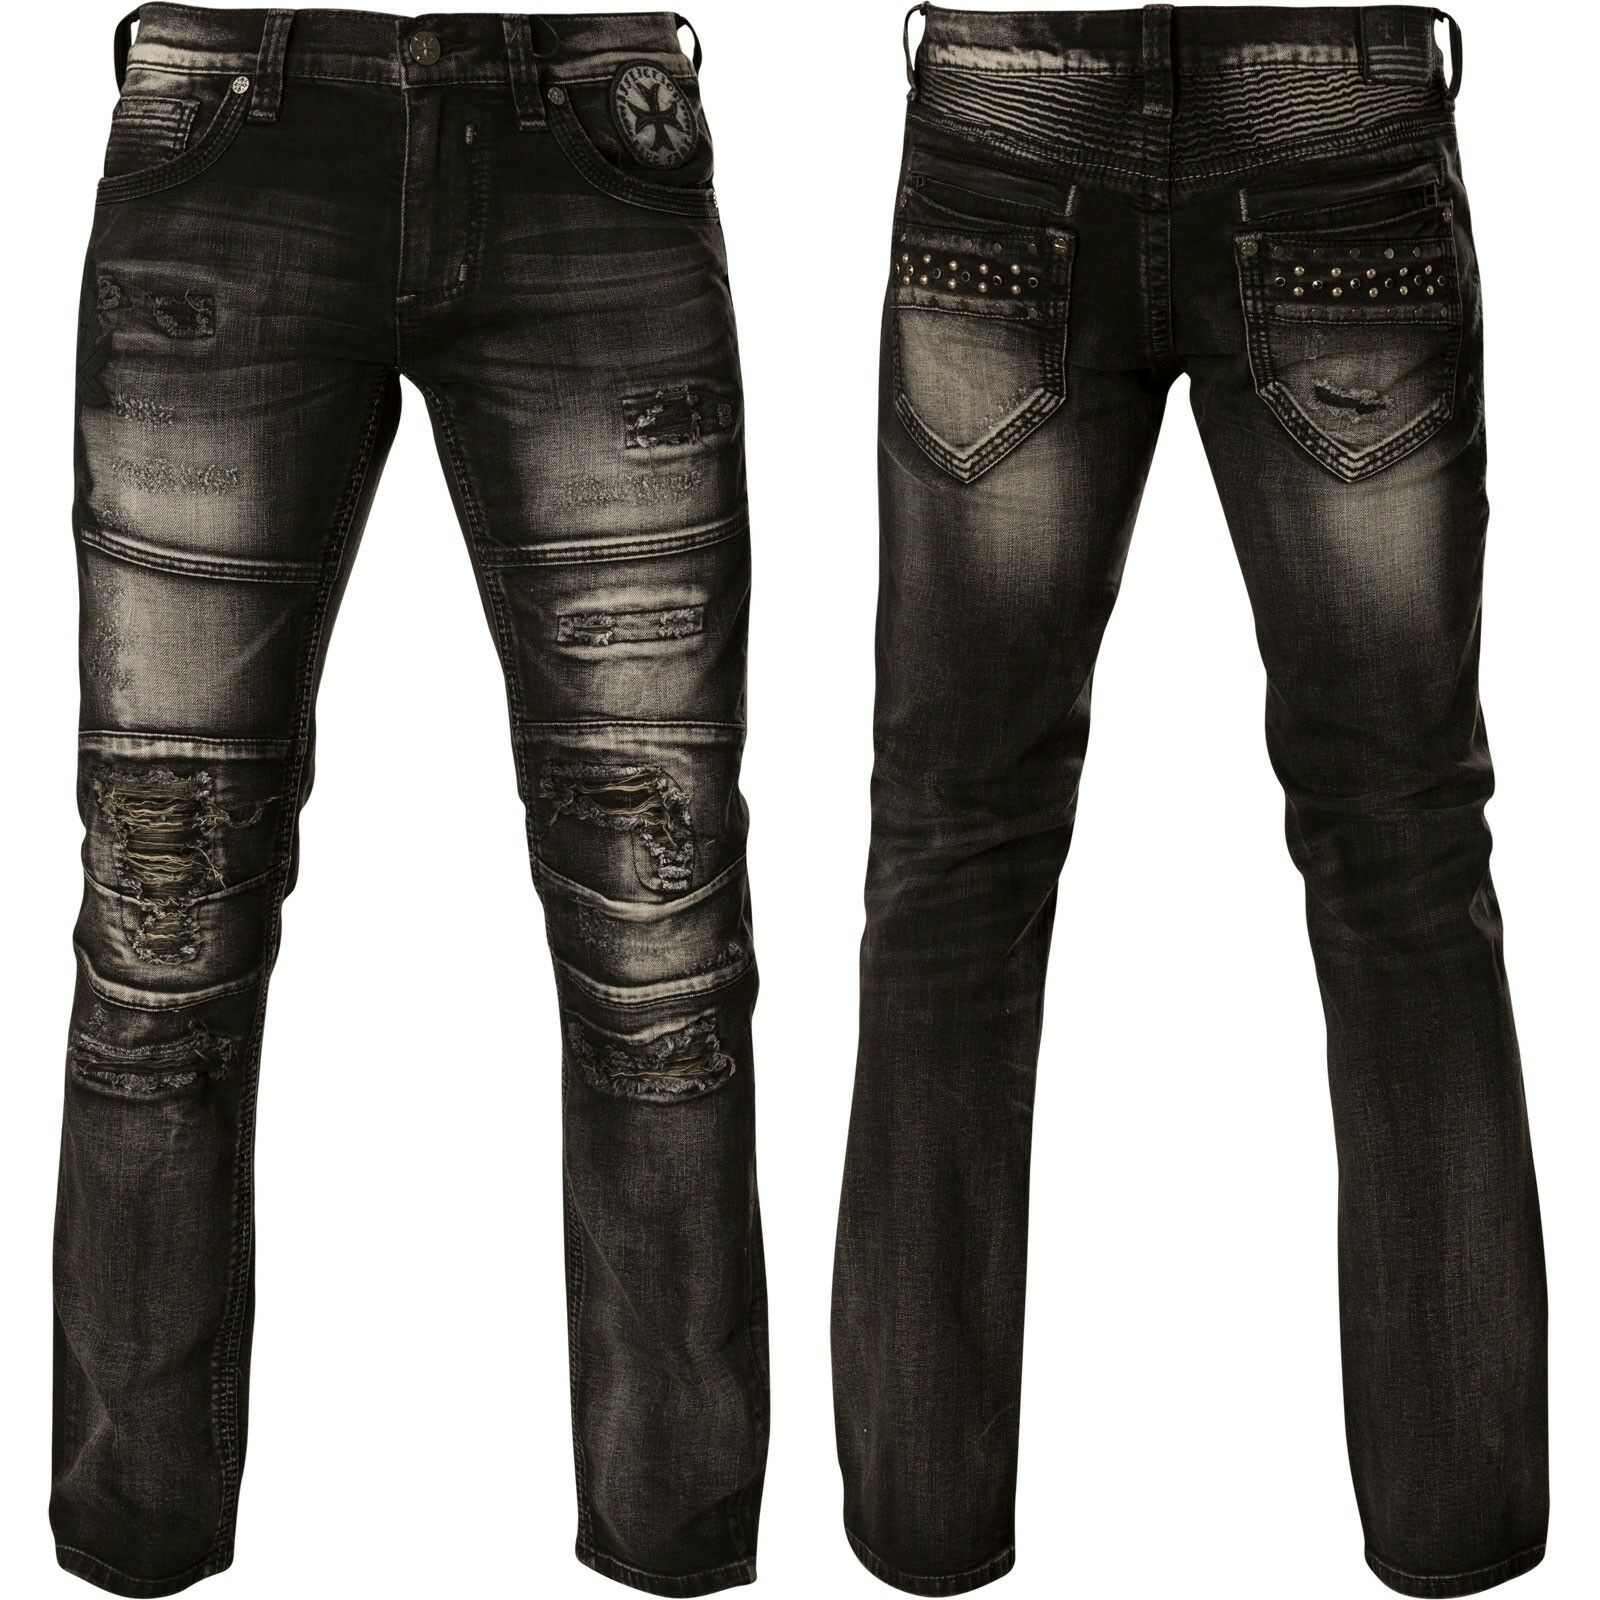 AFFLICTION Jeans Gage Release Release Release Major Schwarz 1cb